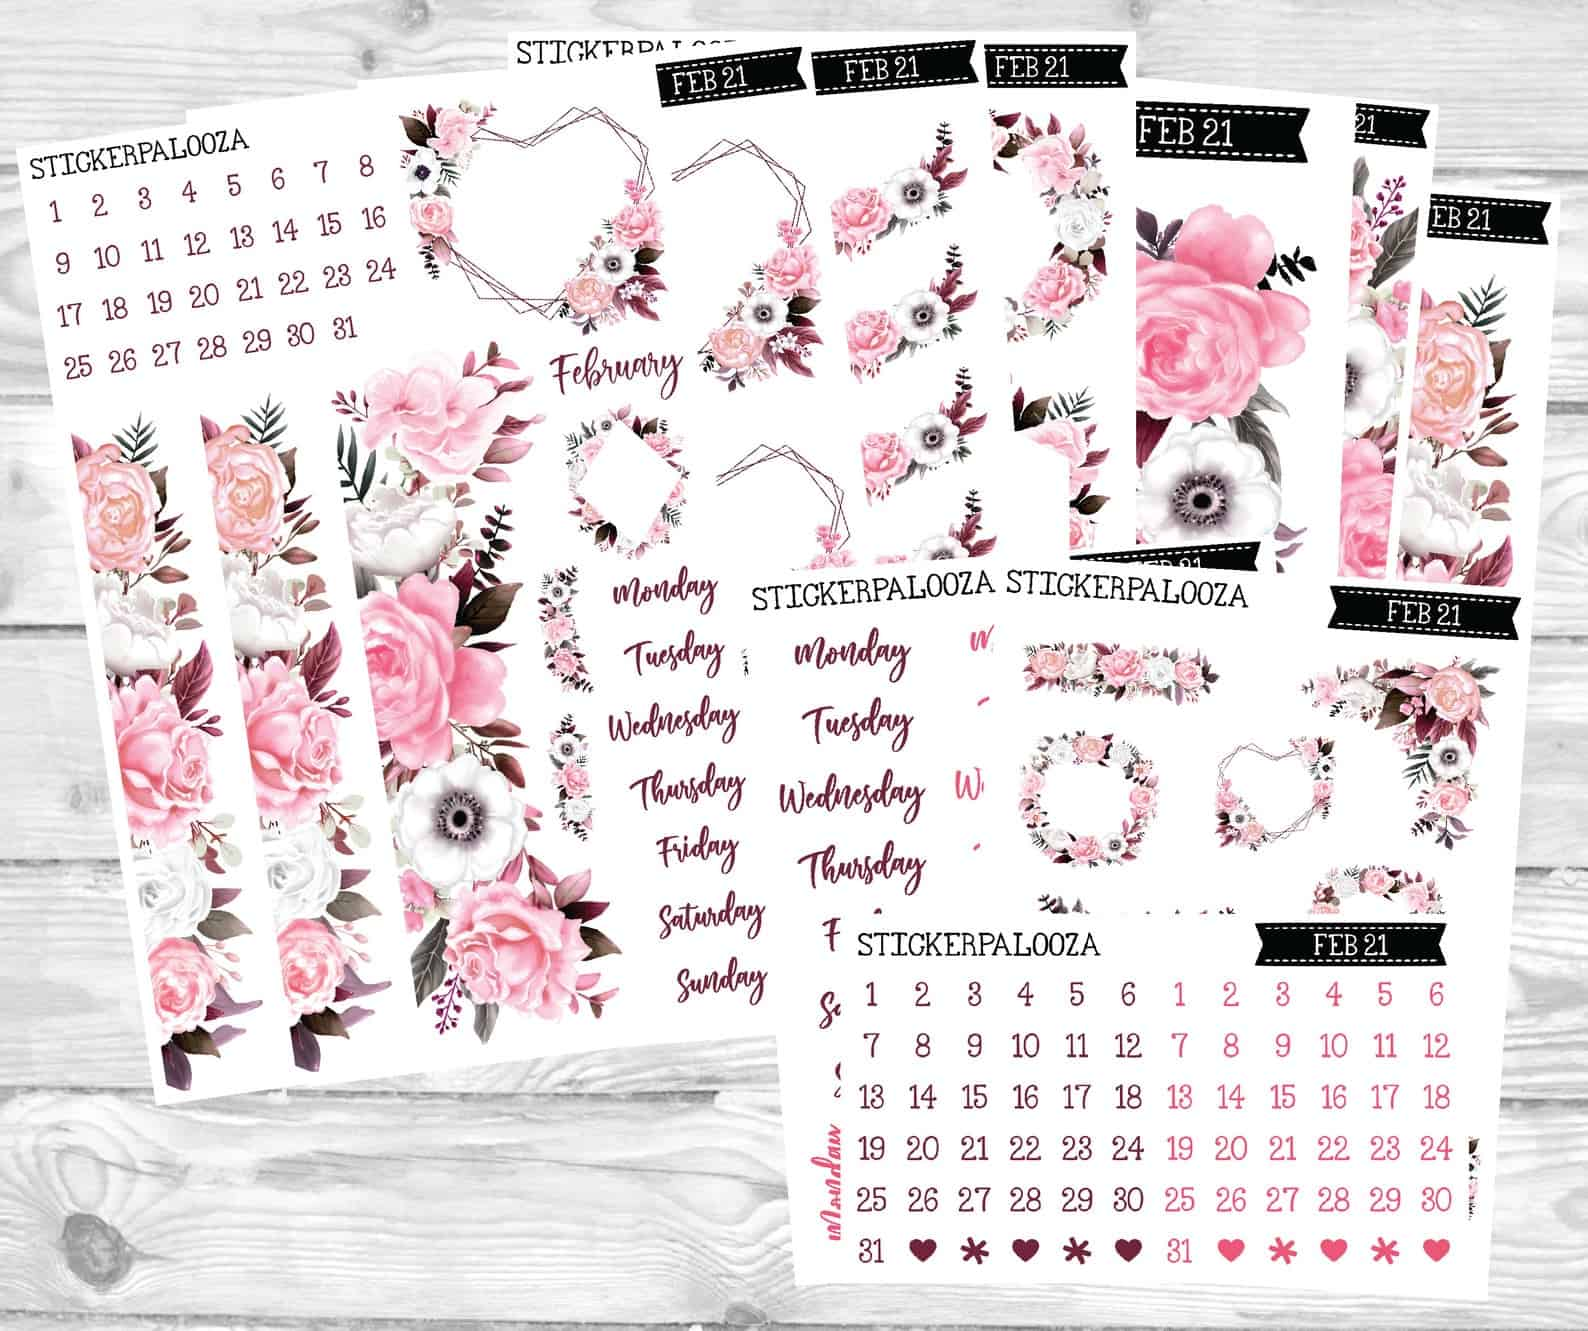 February bullet journal stickerpalooza